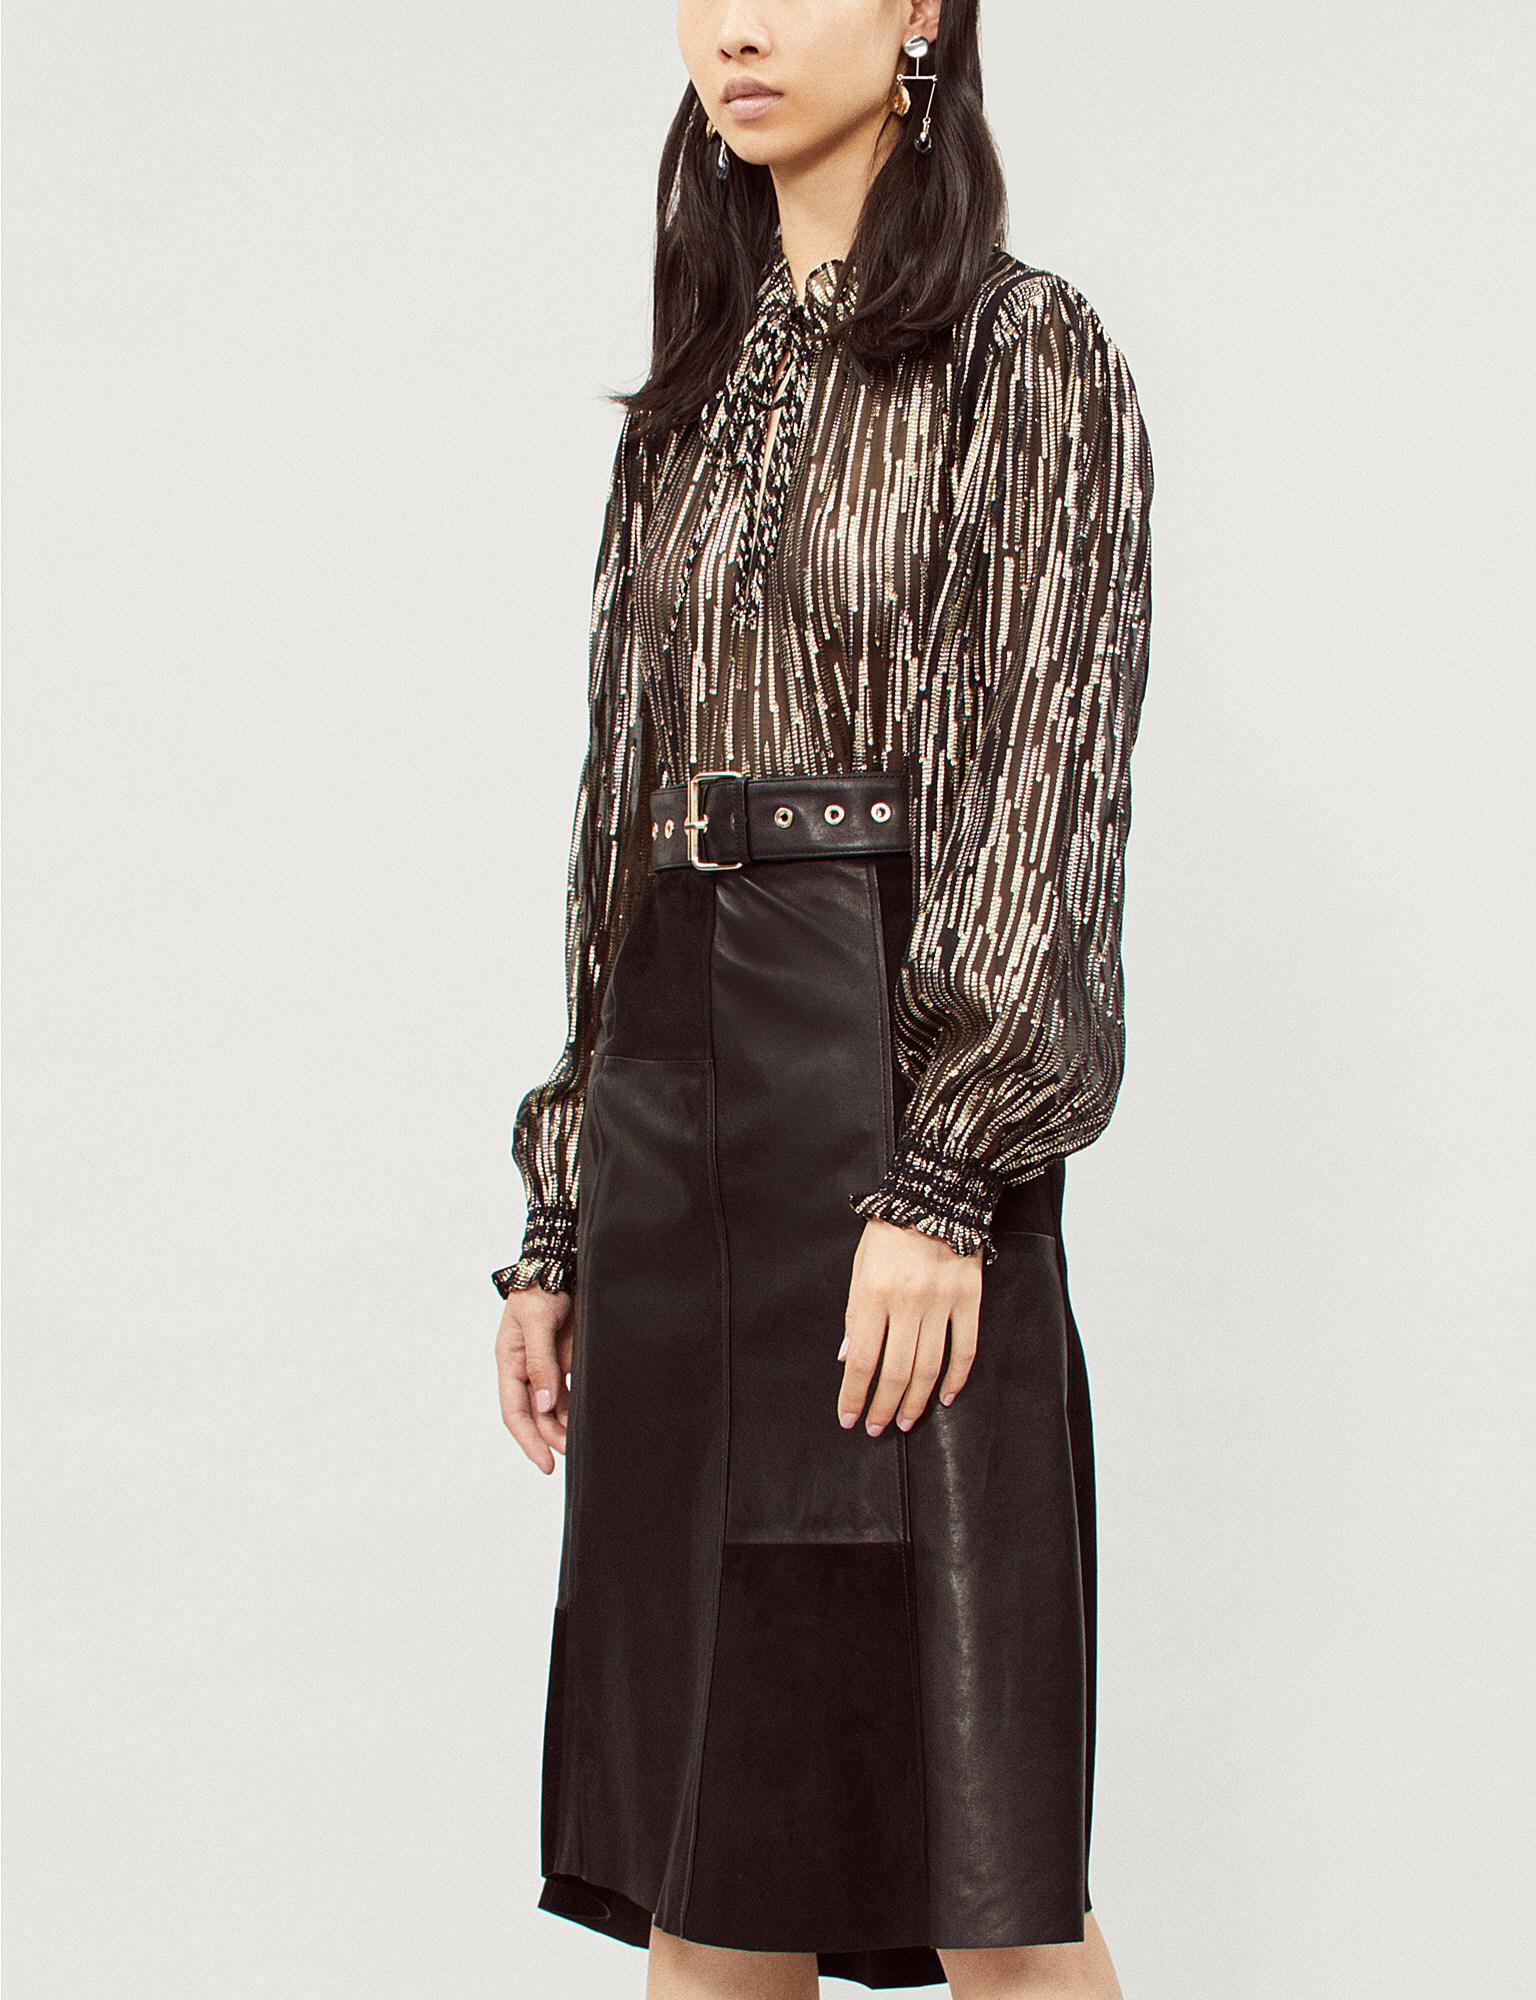 680215d22e12a6 Lyst - Ba Sh Ladies Black Noir Nina Metallic Top in Black